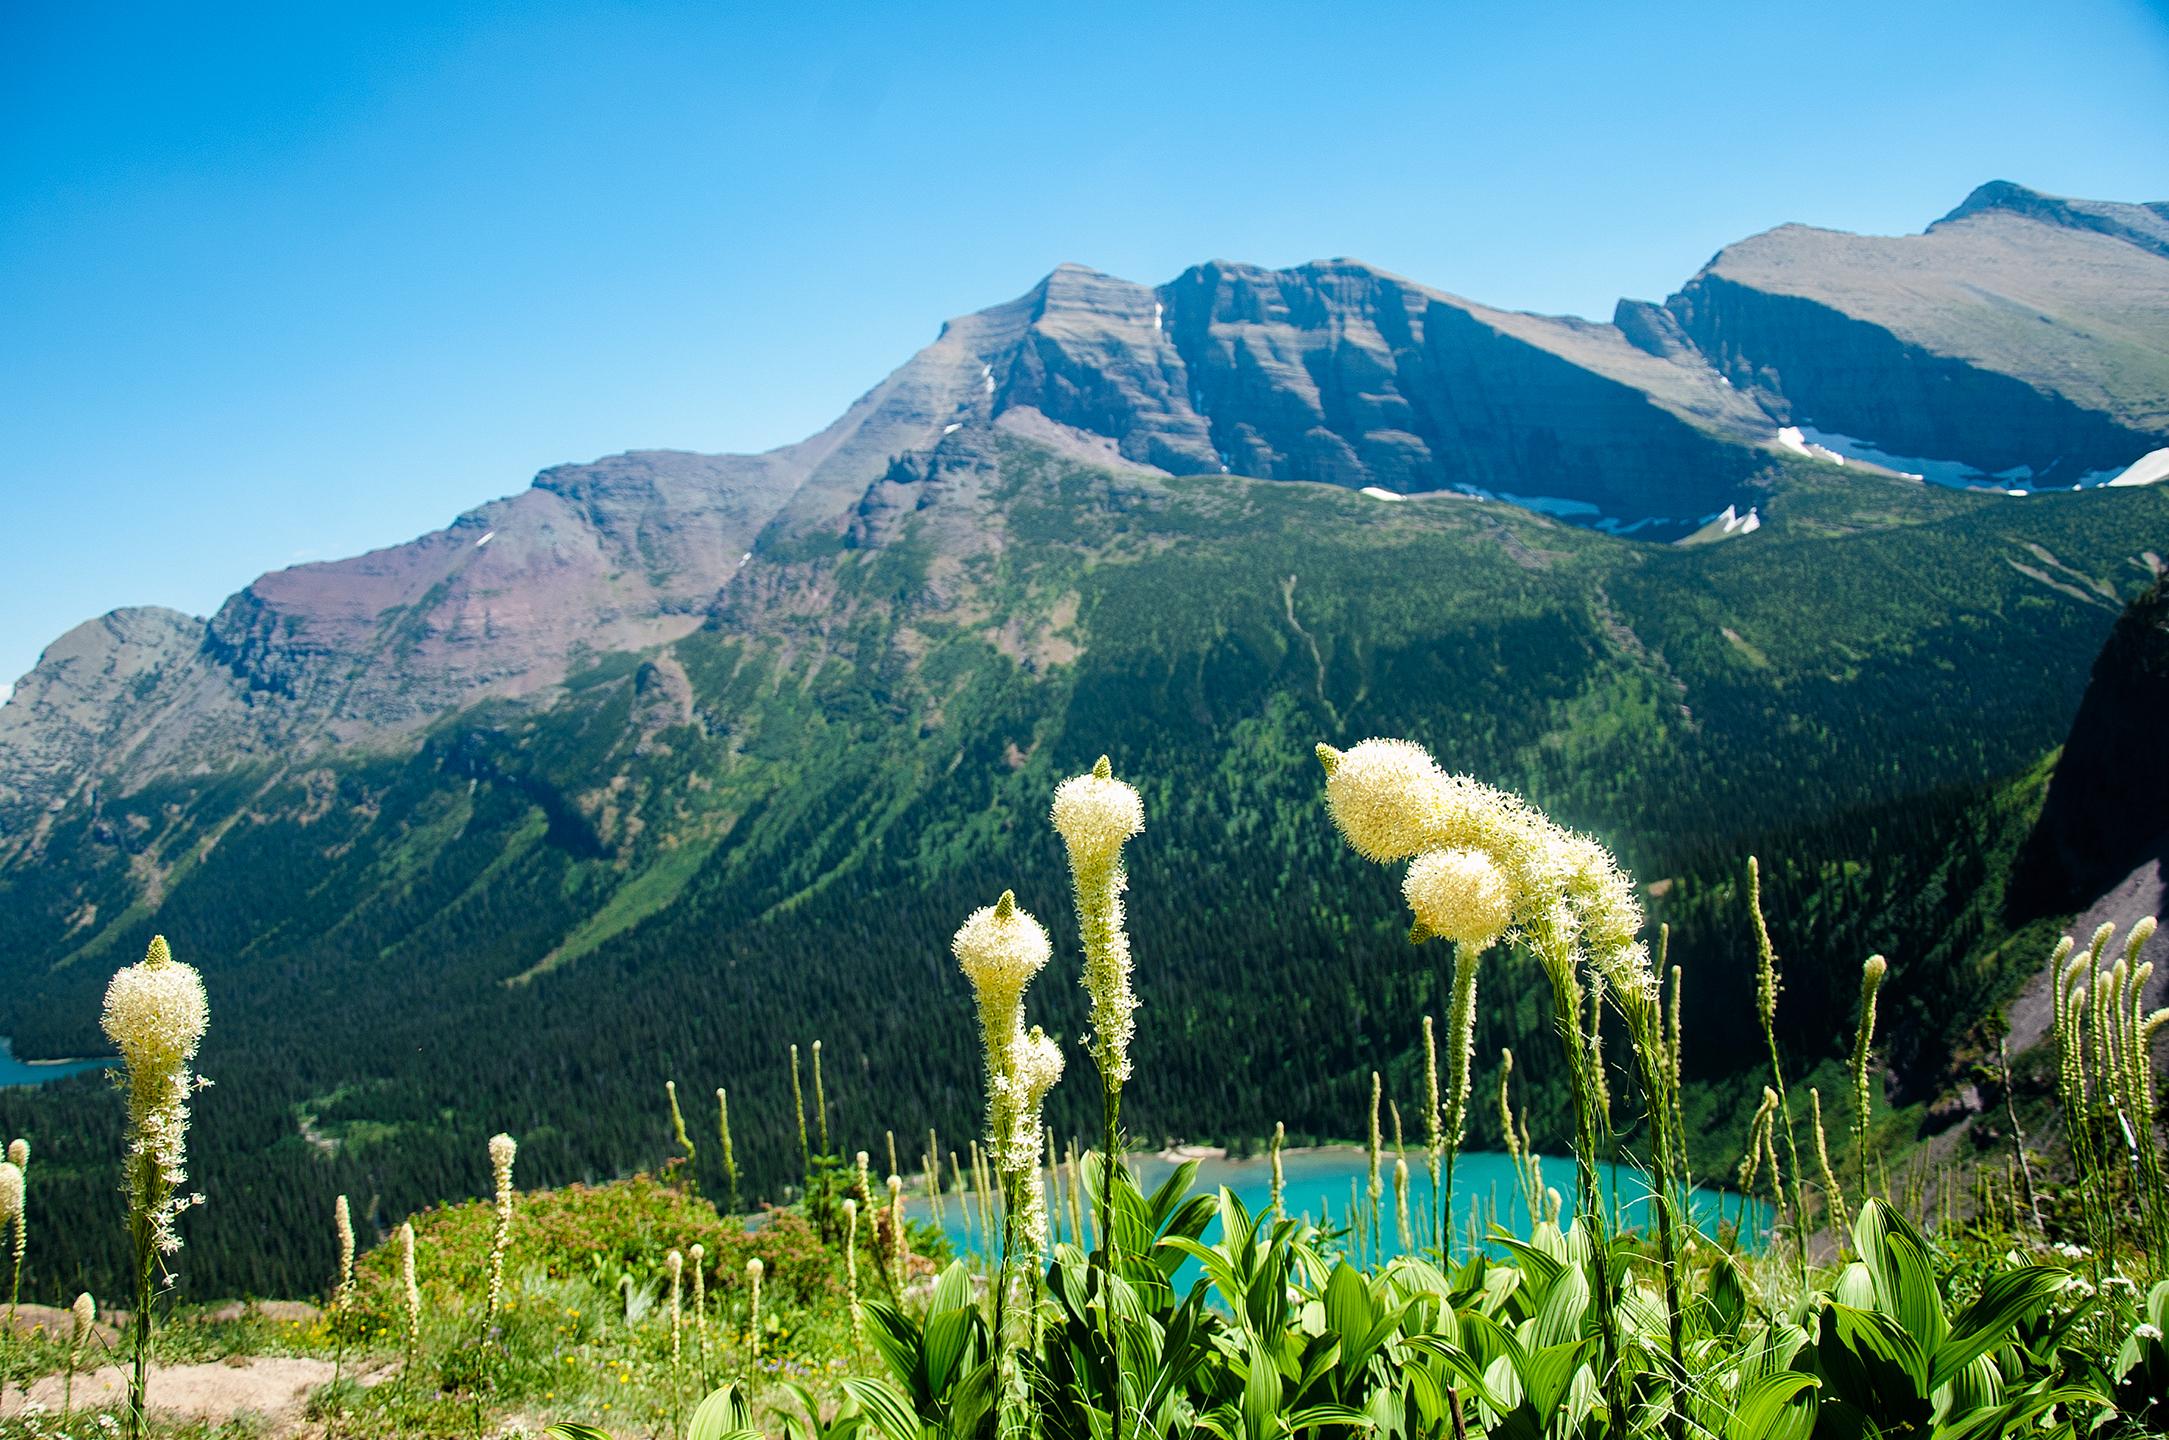 Beargrass over Grinnell Lake, Glacier National Park, MT